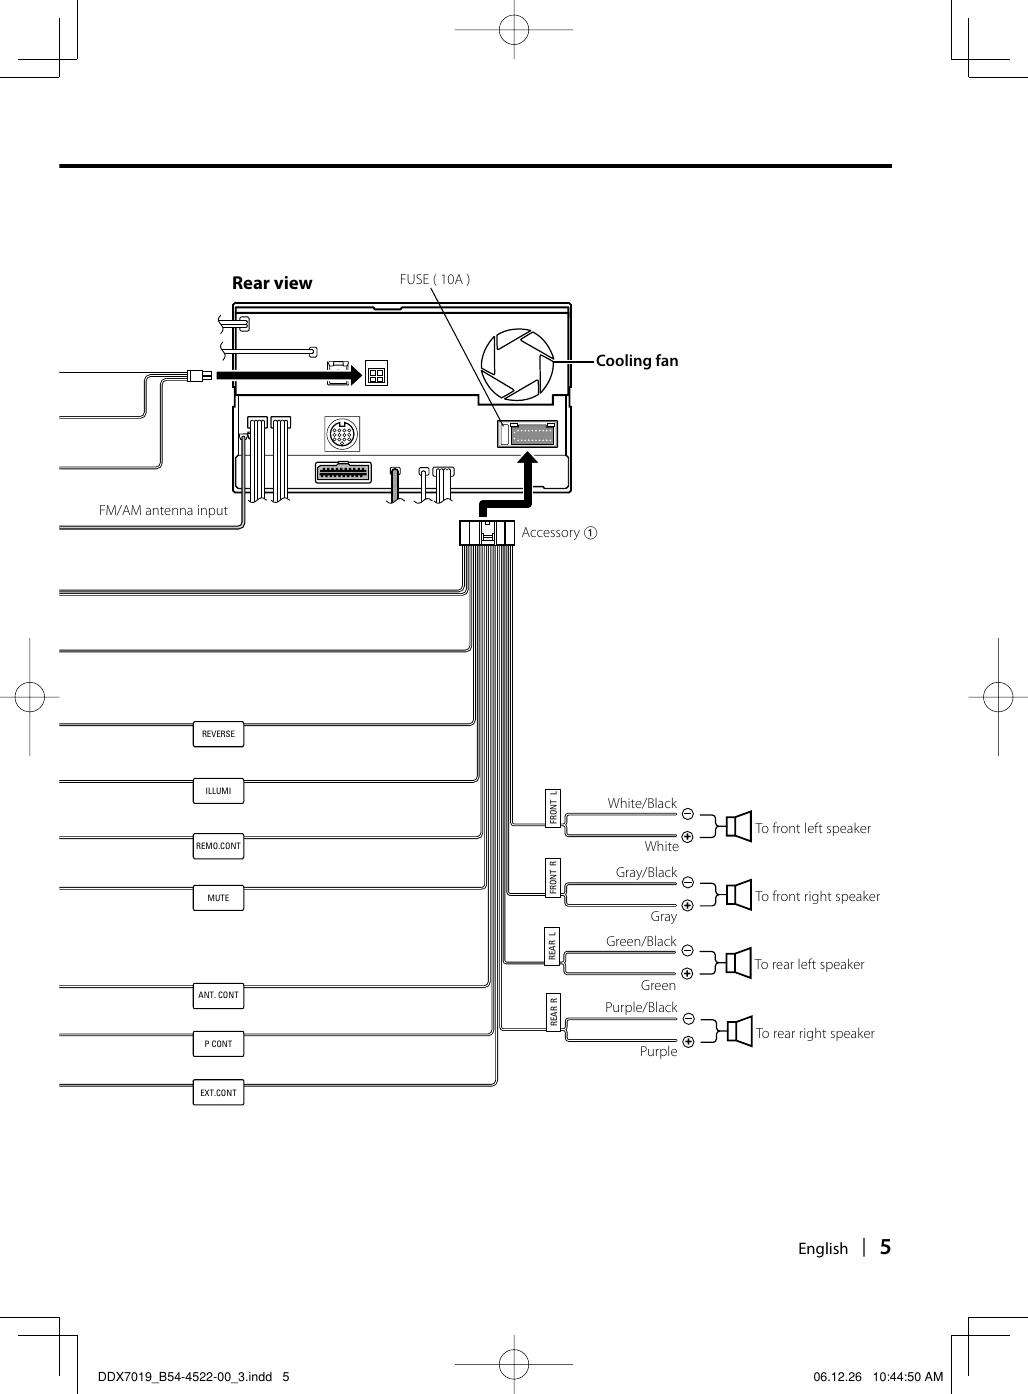 aswc 1 wiring diagram narva sealed switch infiniti g35 harness metra door lock